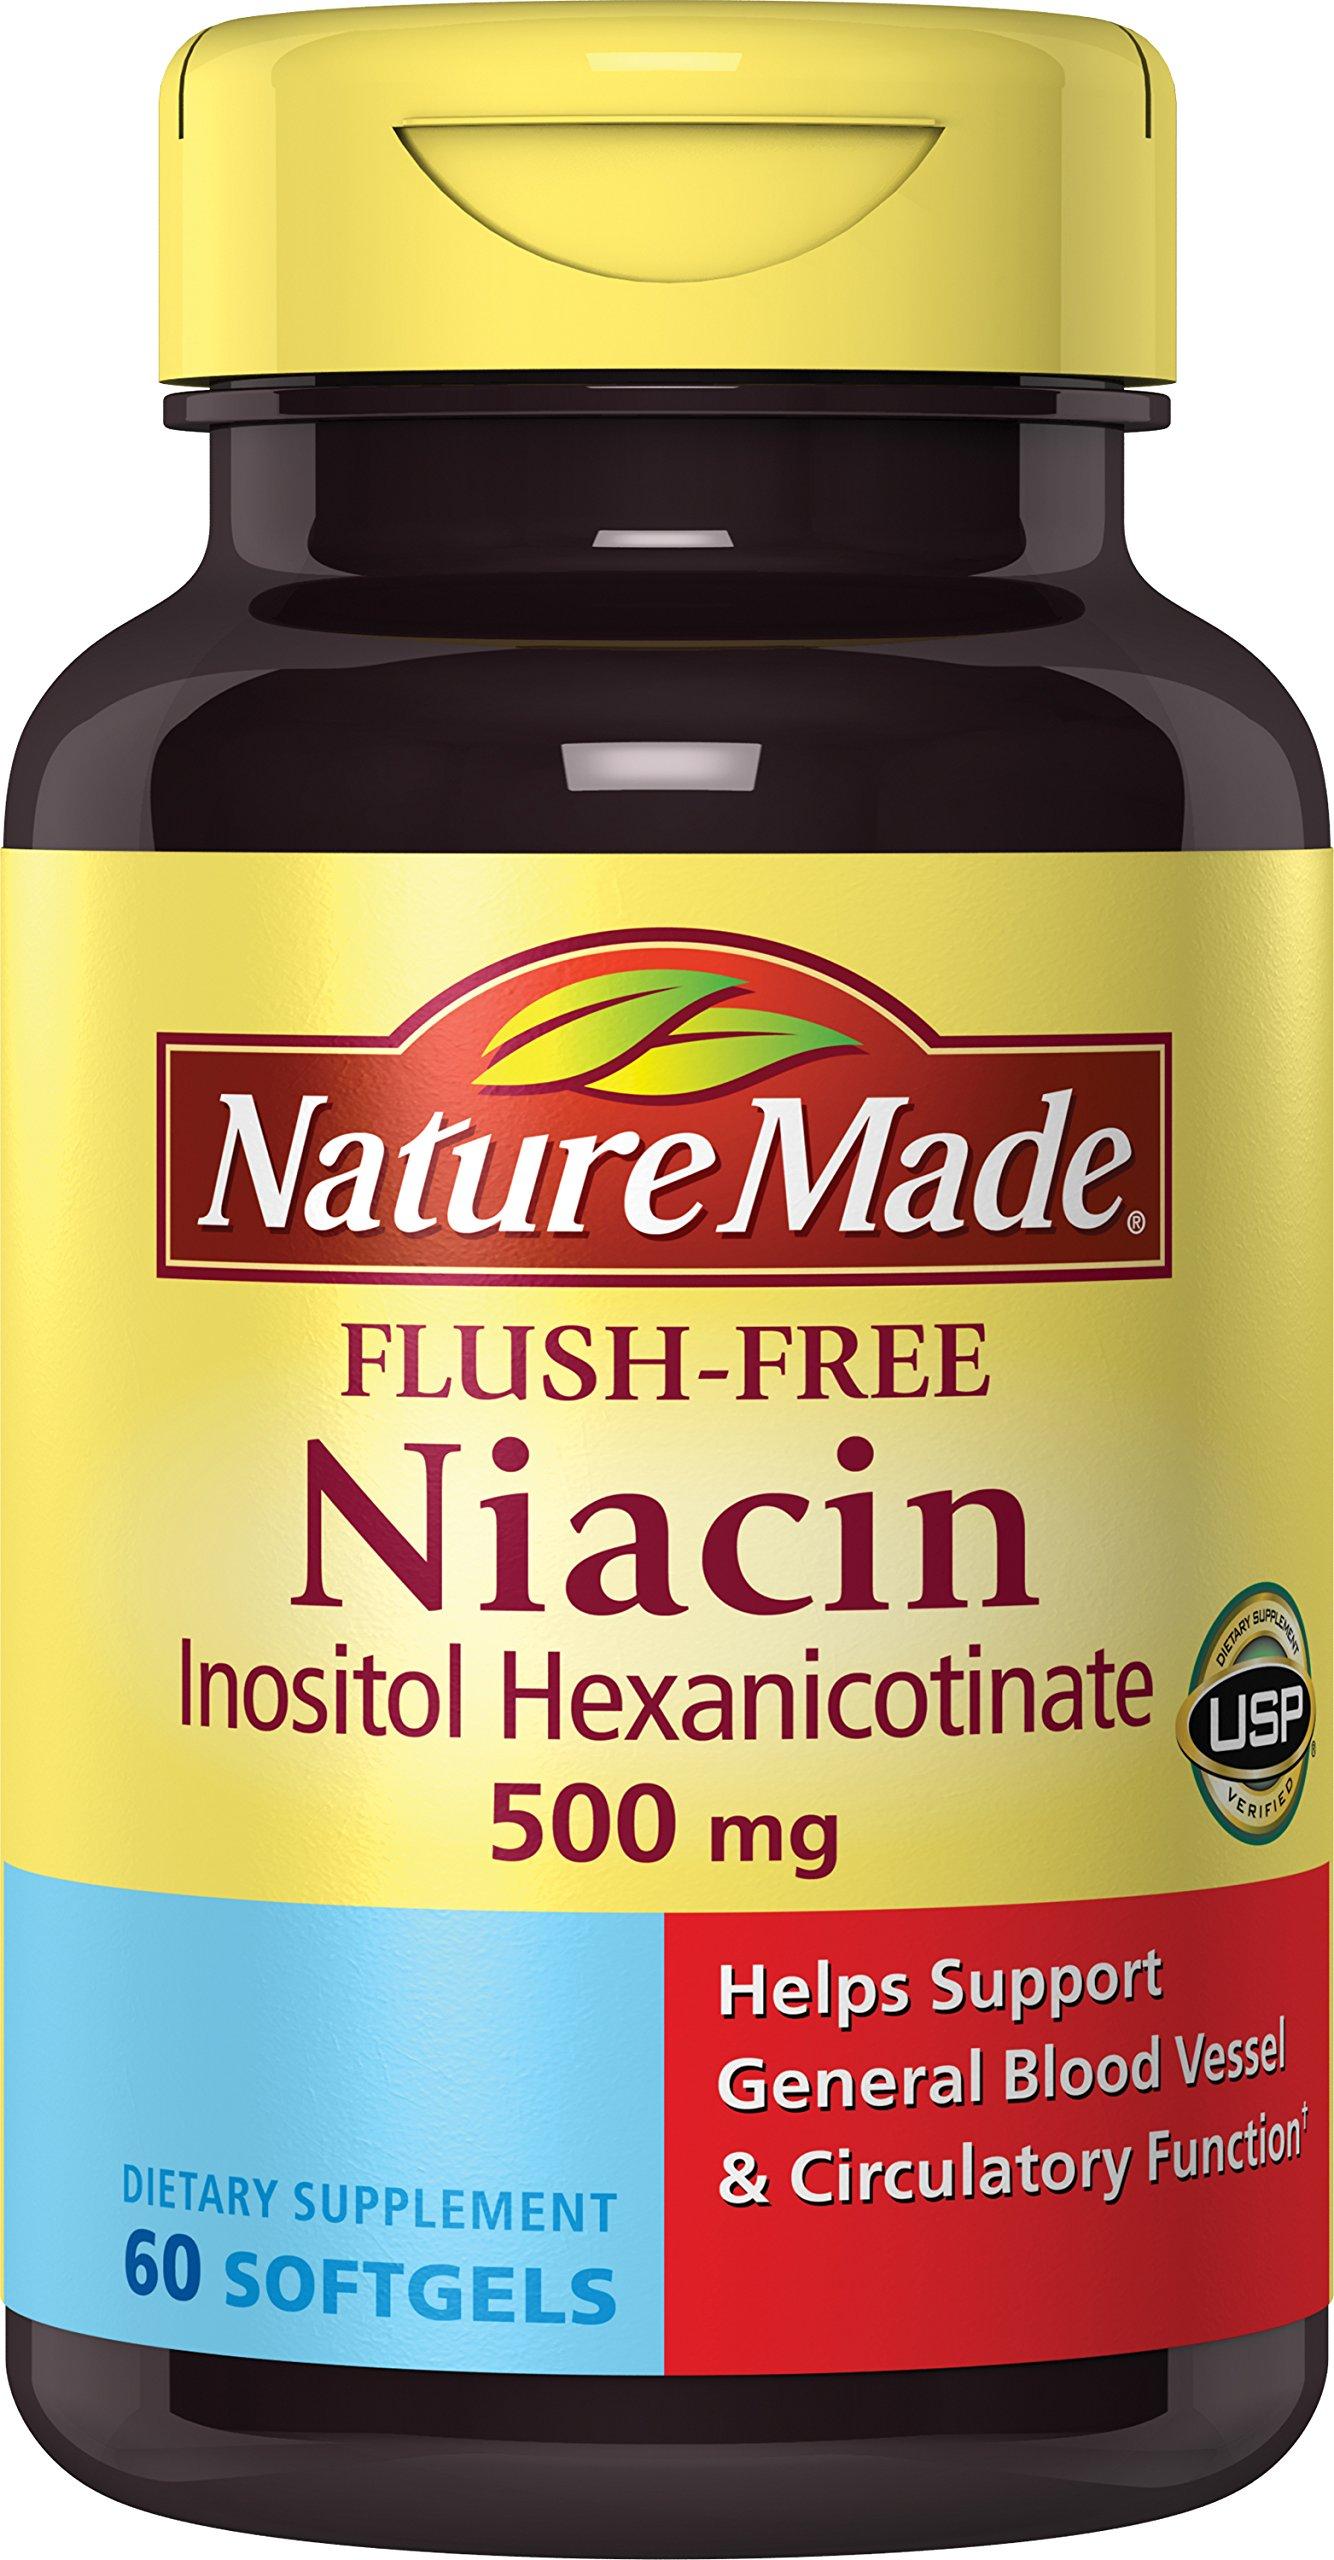 Nature Made Flush-Free Niacin (B3) 500 mg. Softgels 60 Ct